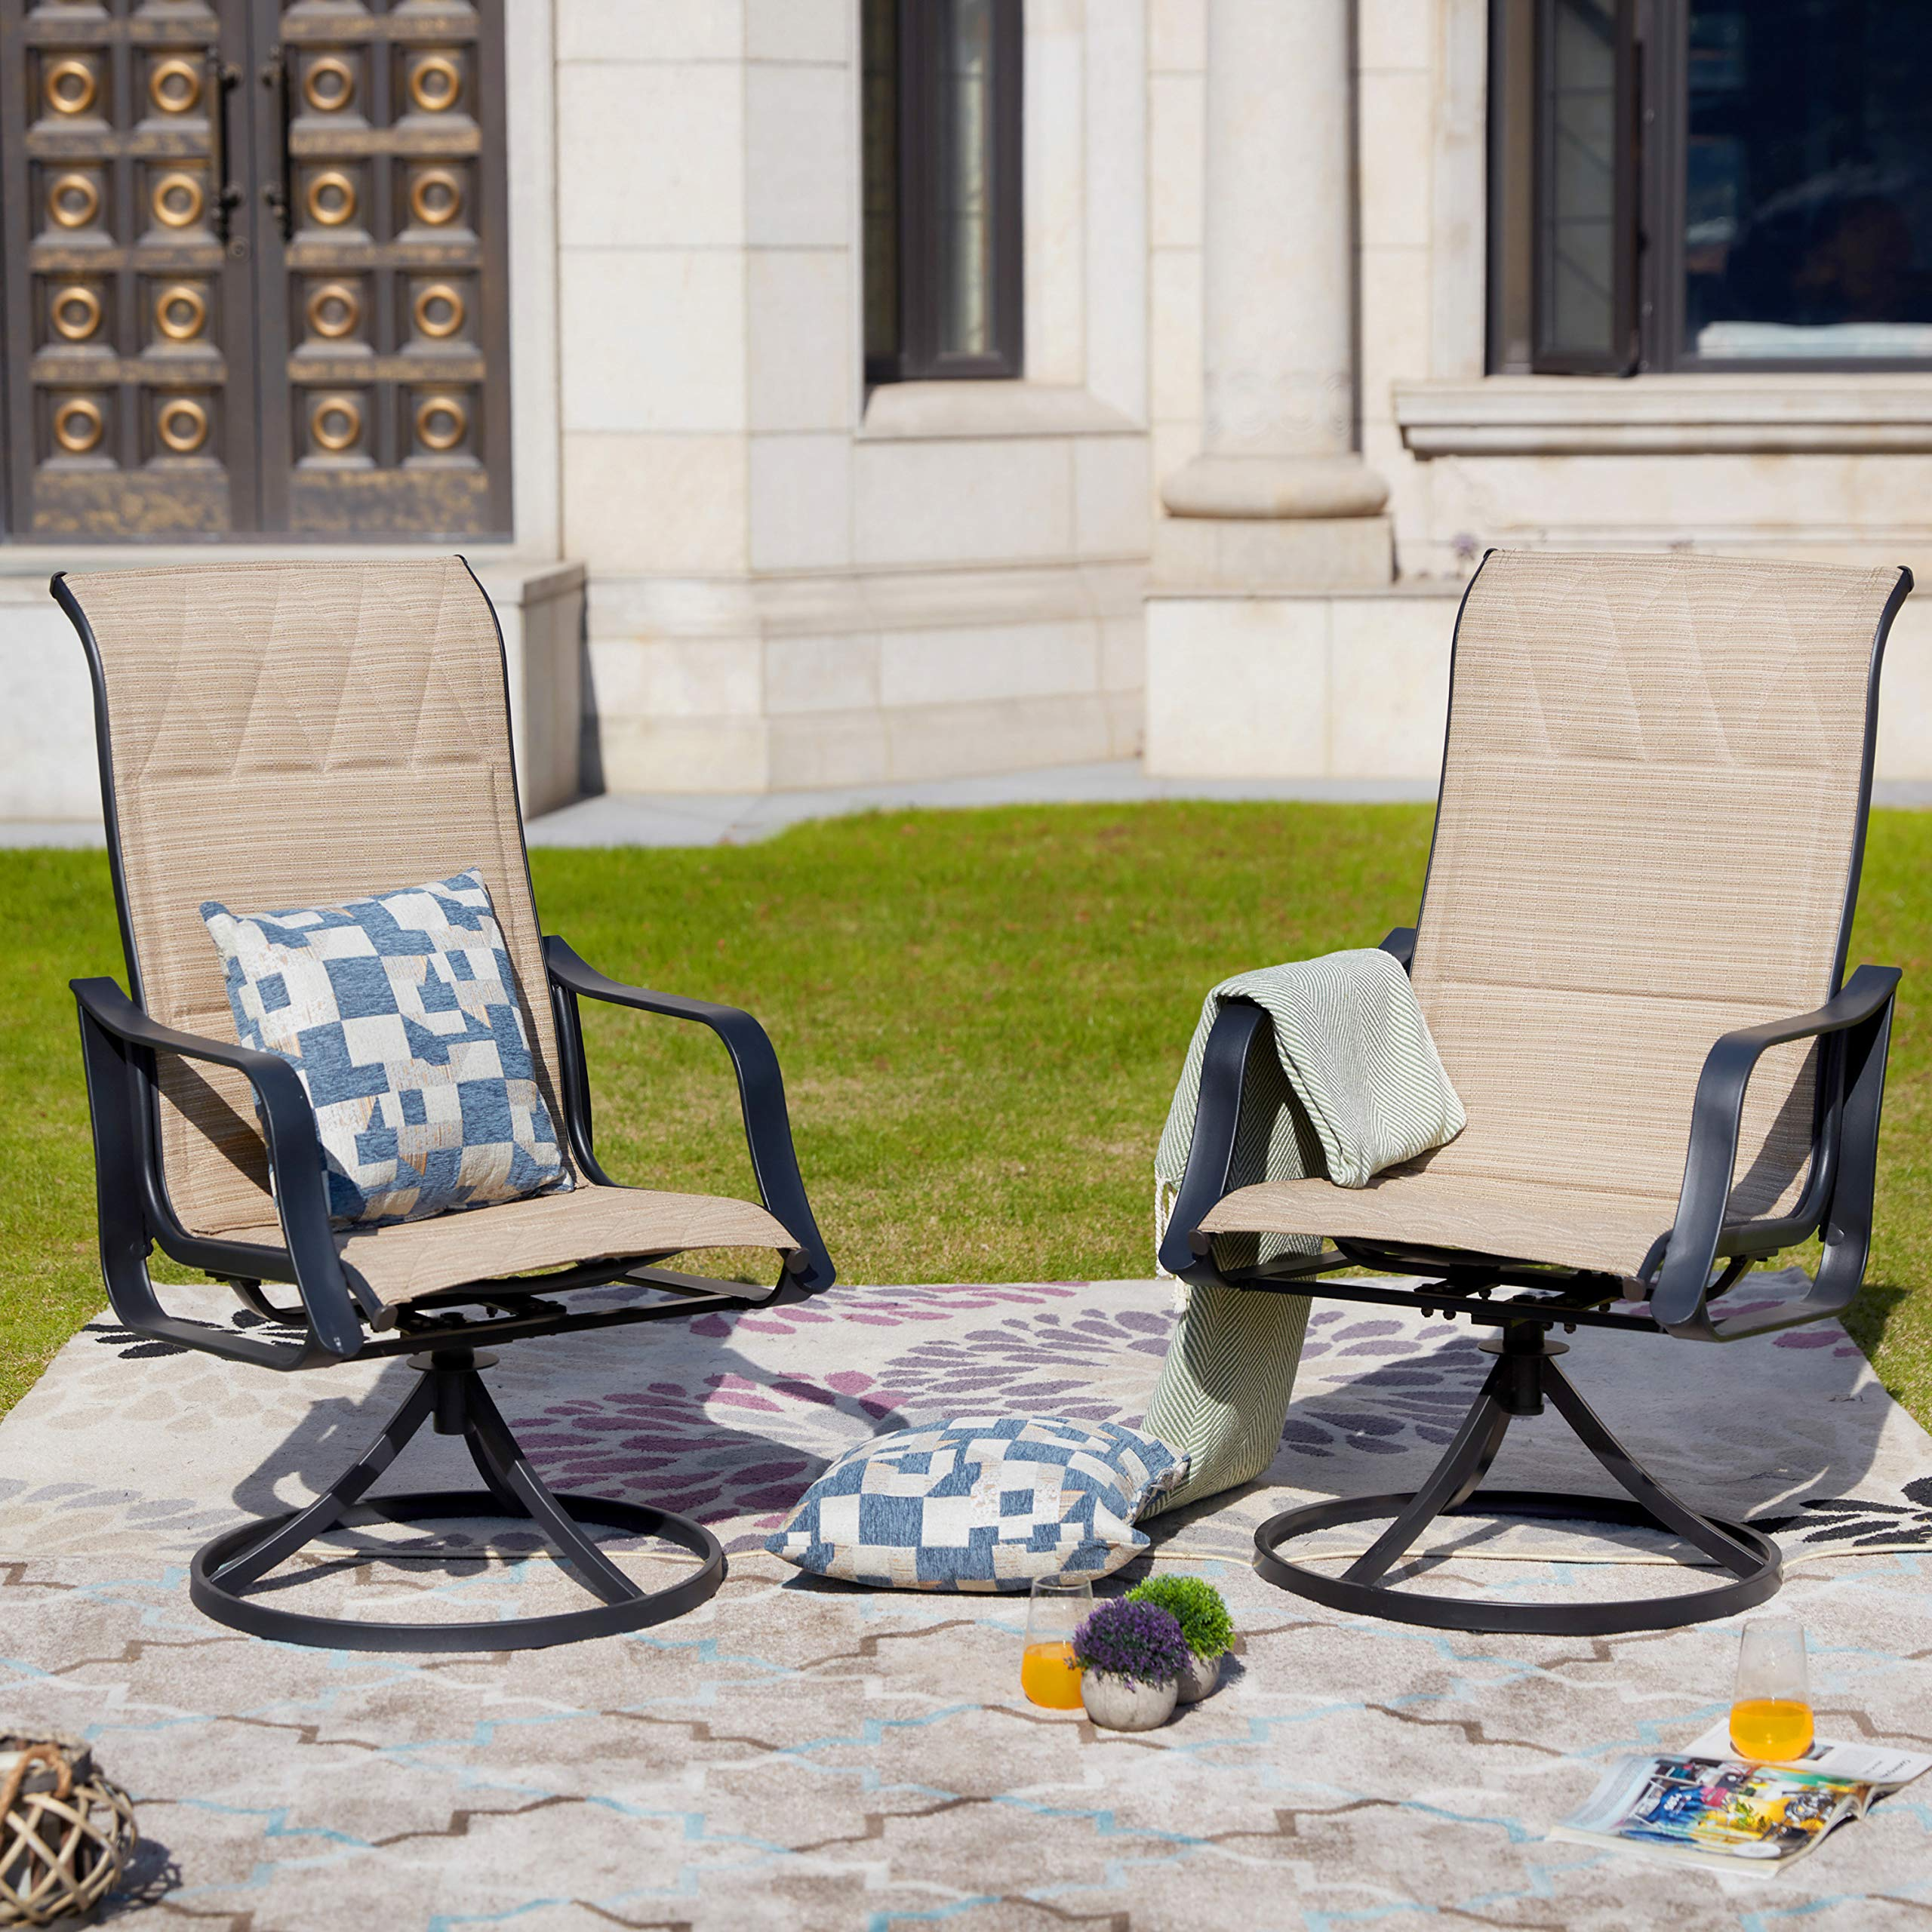 LOKATSE HOME Outdoor Patio Swivel Rocking Chair Set Sling(Set of 2), Beige by LOKATSE HOME